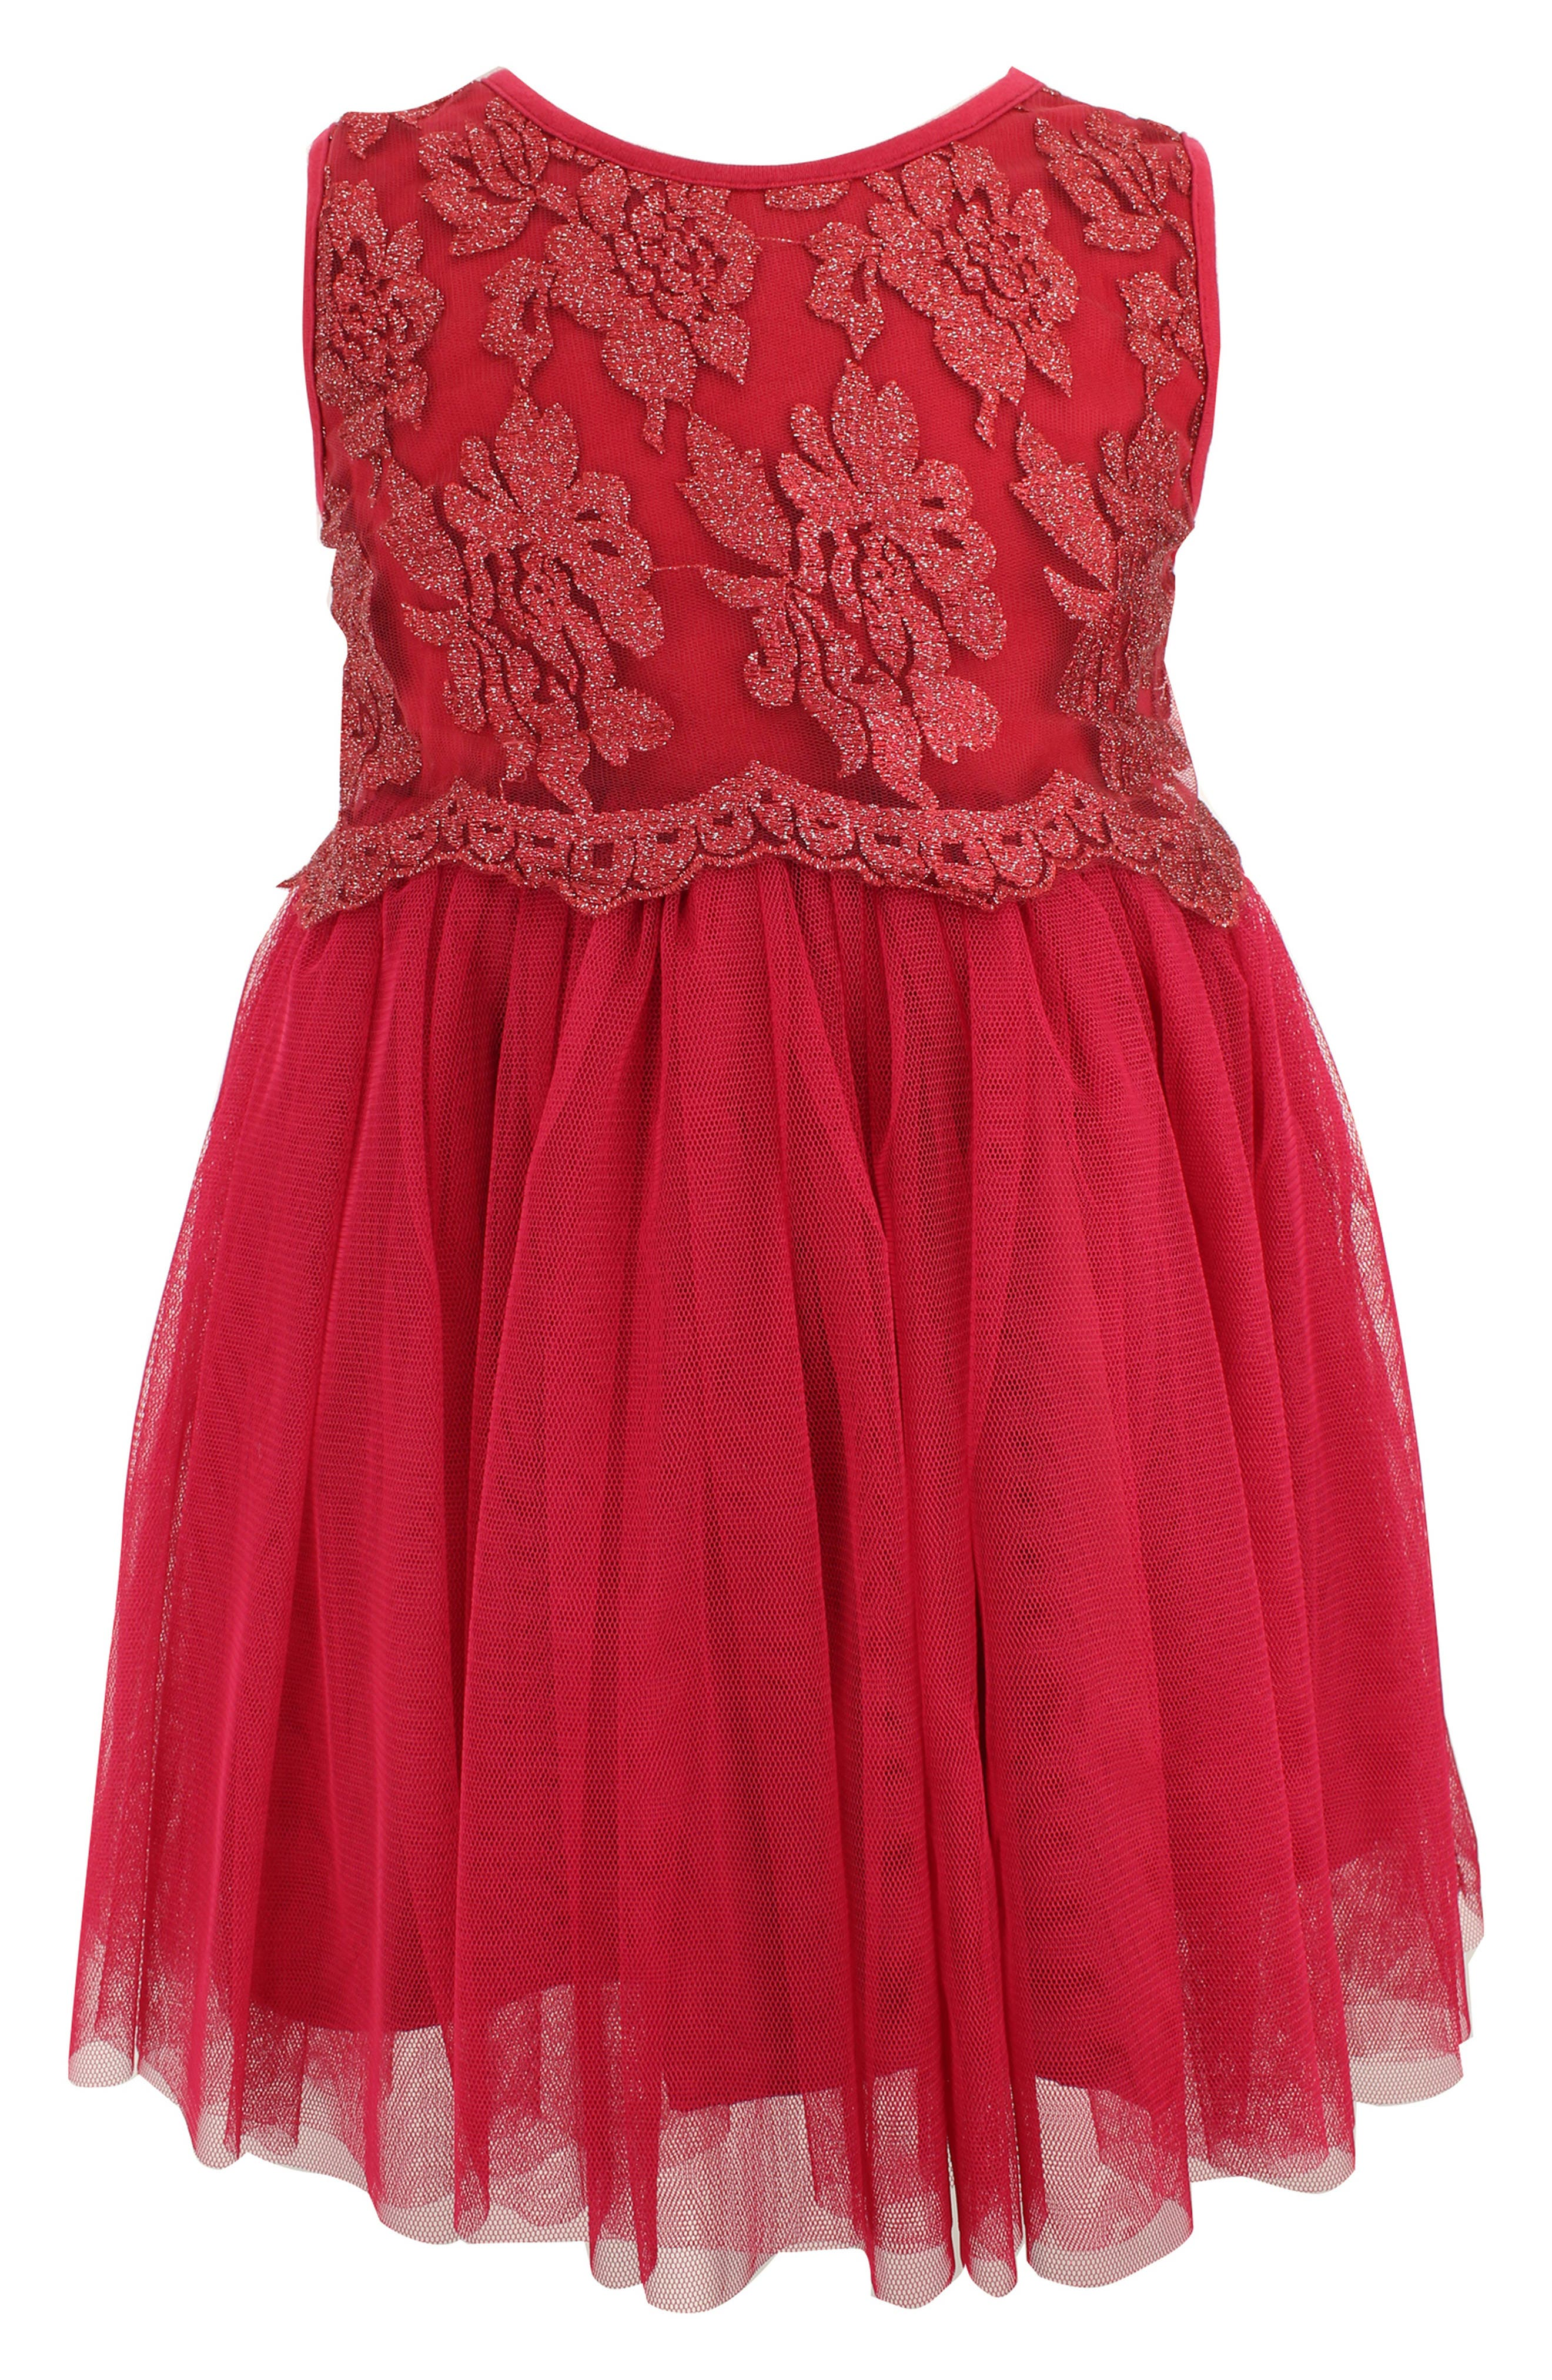 POPATU, Lace Tulle Dress, Main thumbnail 1, color, BURGUNDY